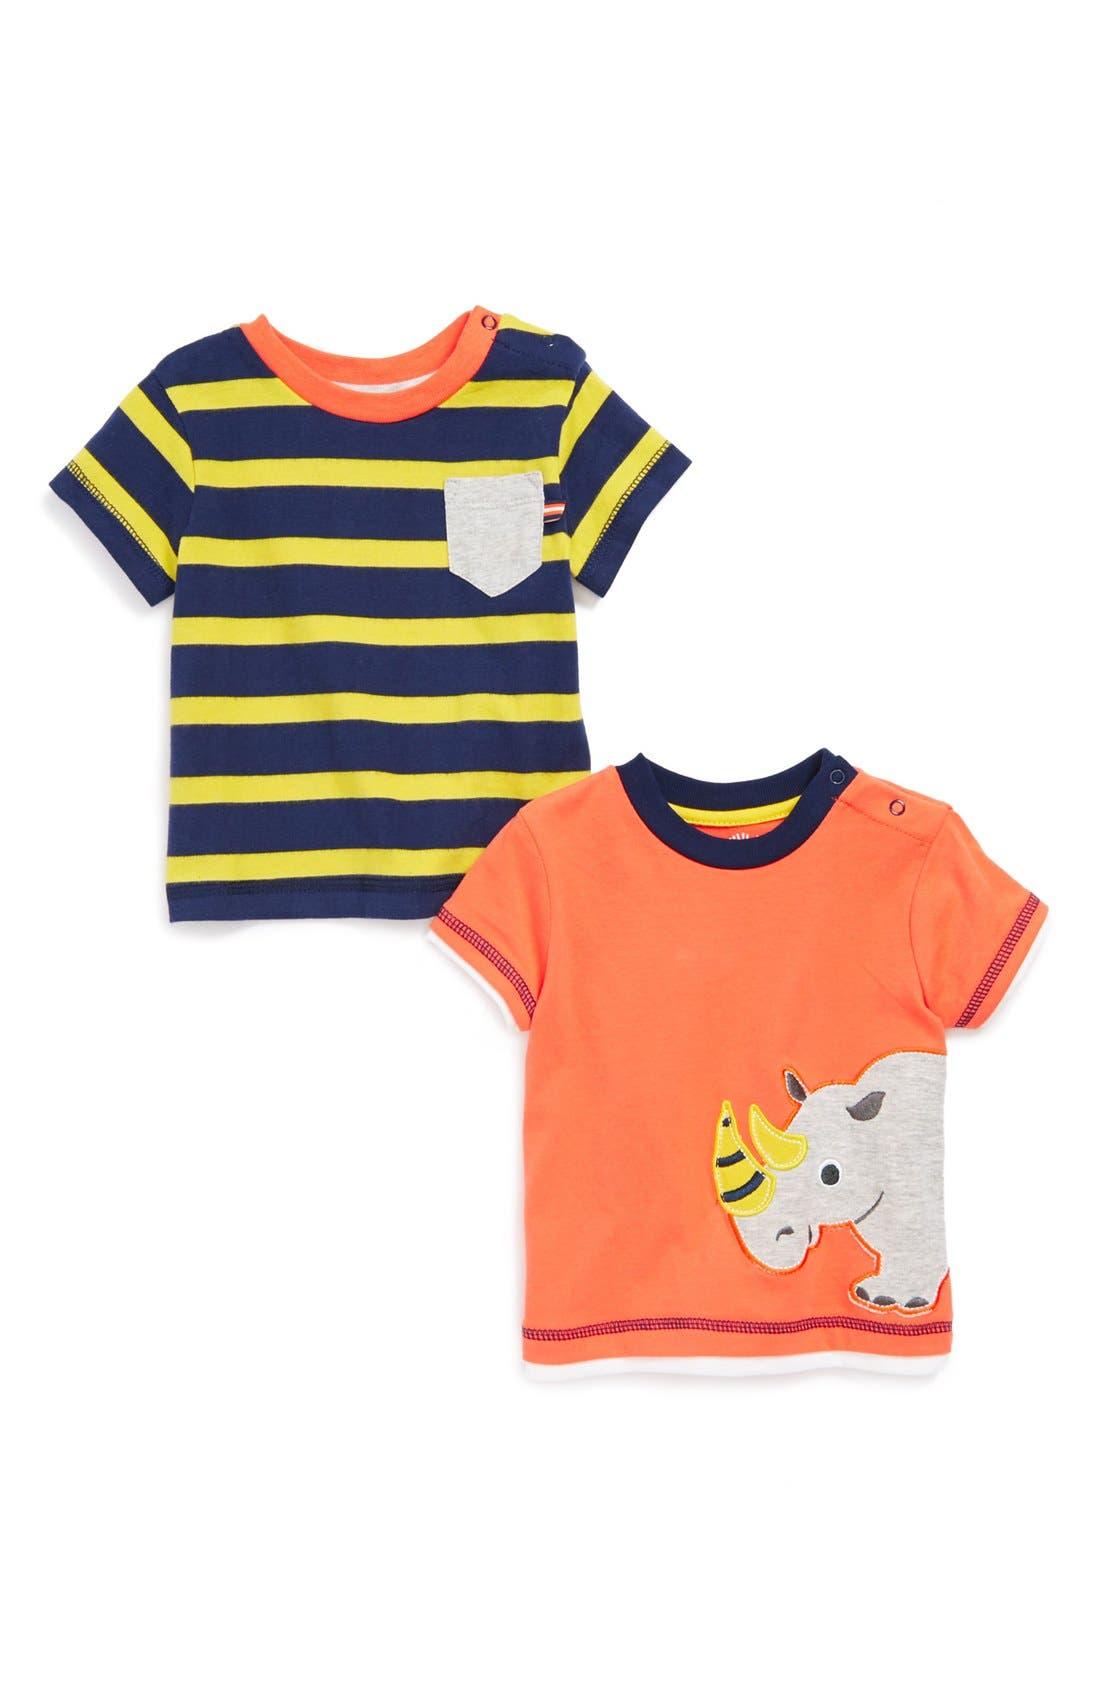 Main Image - Little Me 'Rhino' T-Shirts (2-Pack) (Baby Boys)